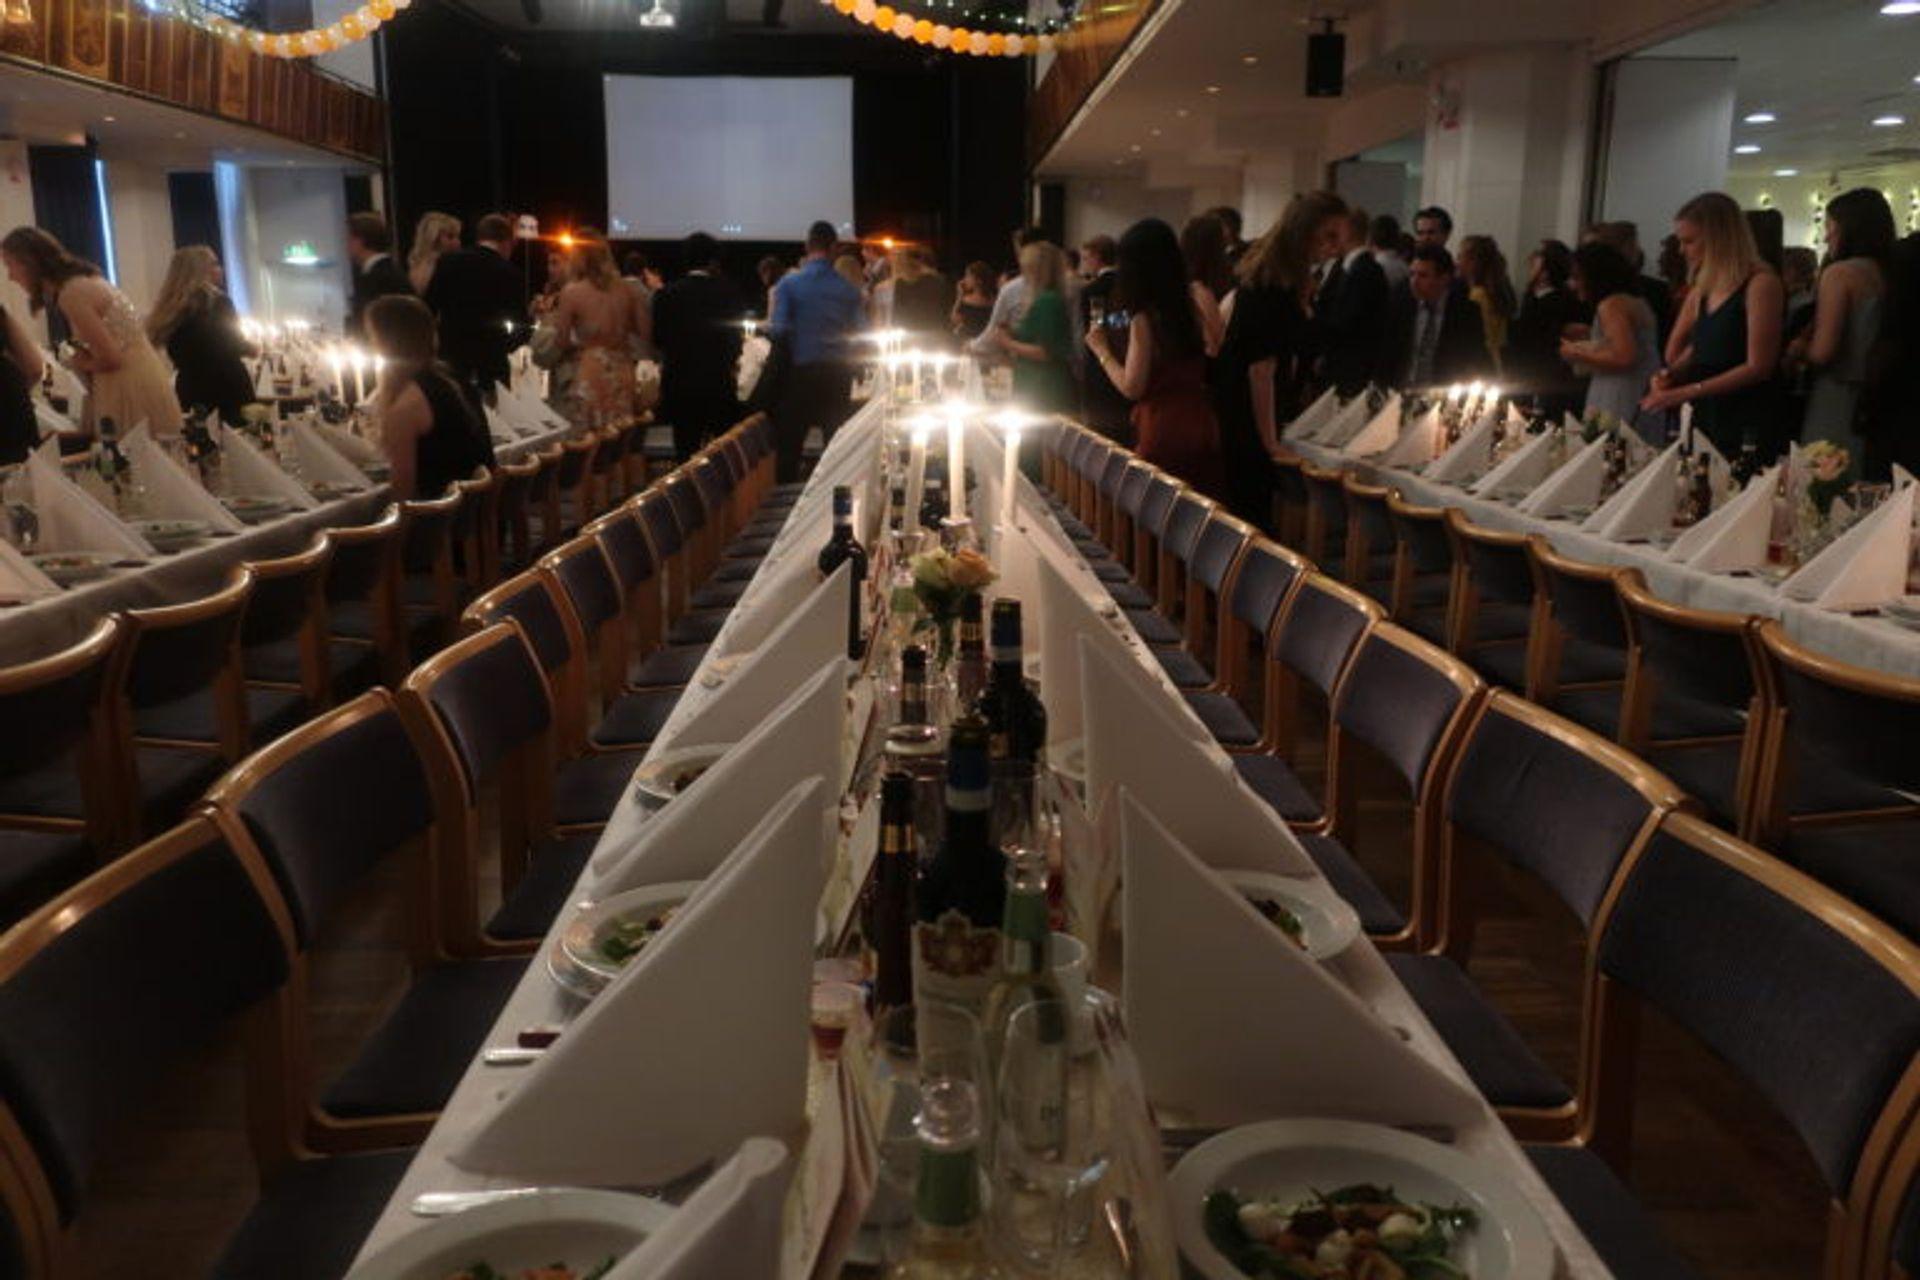 Rows of seats at a long table.